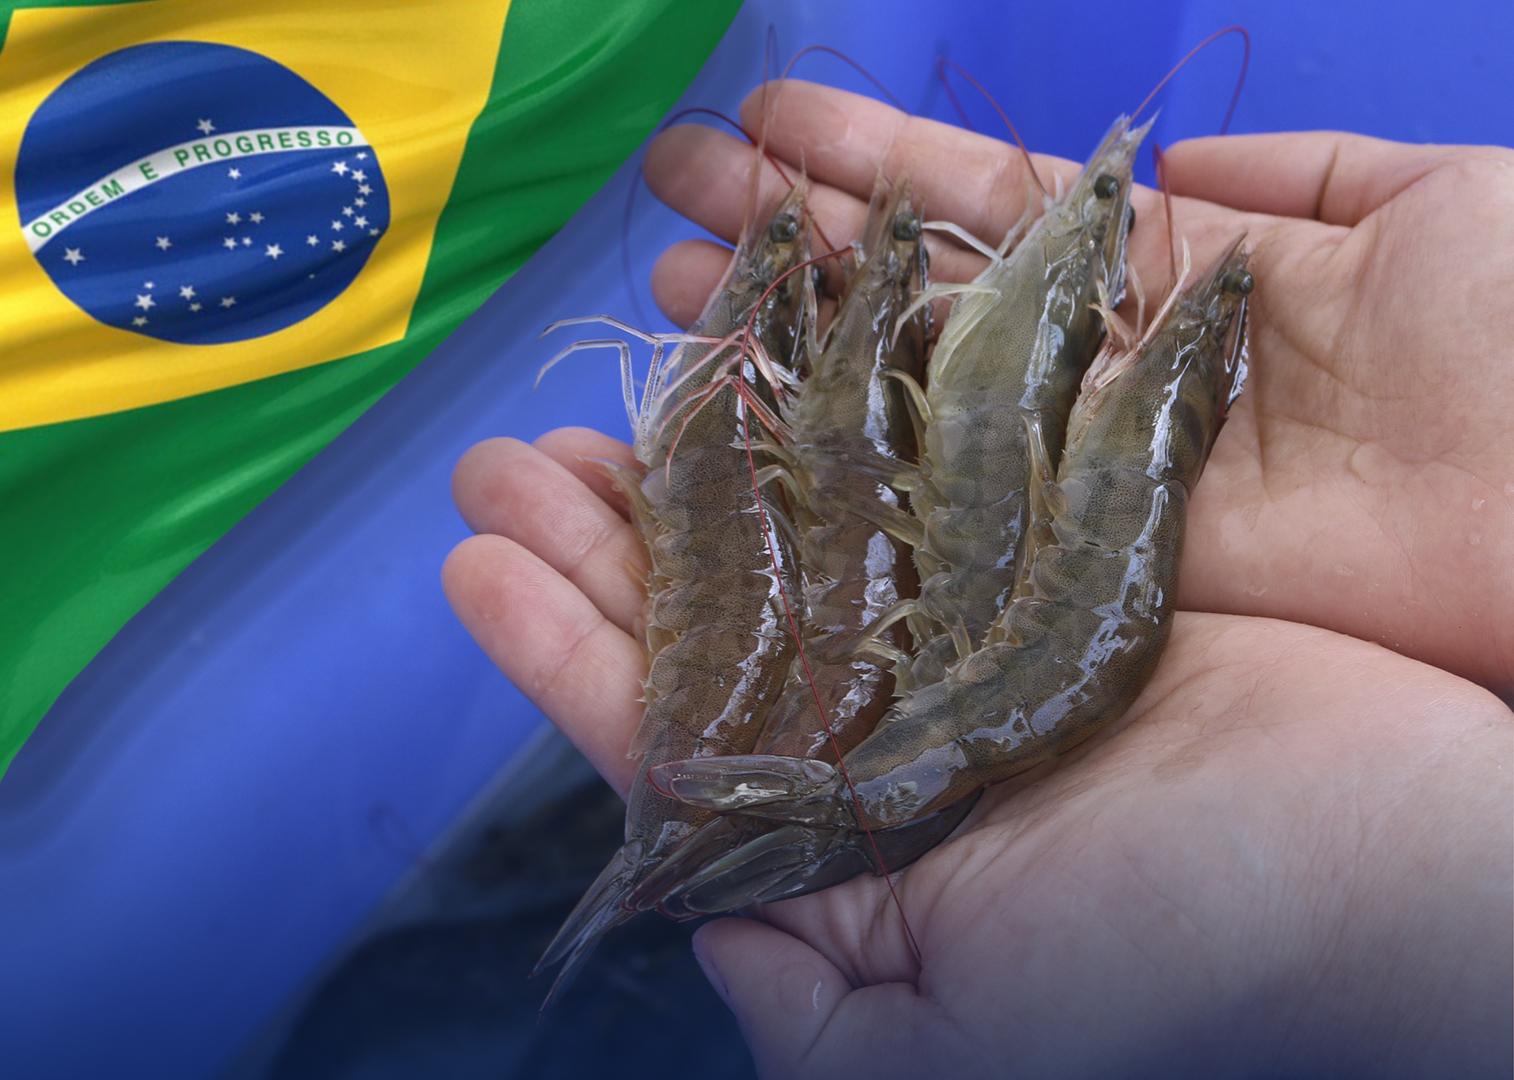 CAMARÓN ECUATORIANO INGRESARÁ NUEVAMENTE A BRASIL